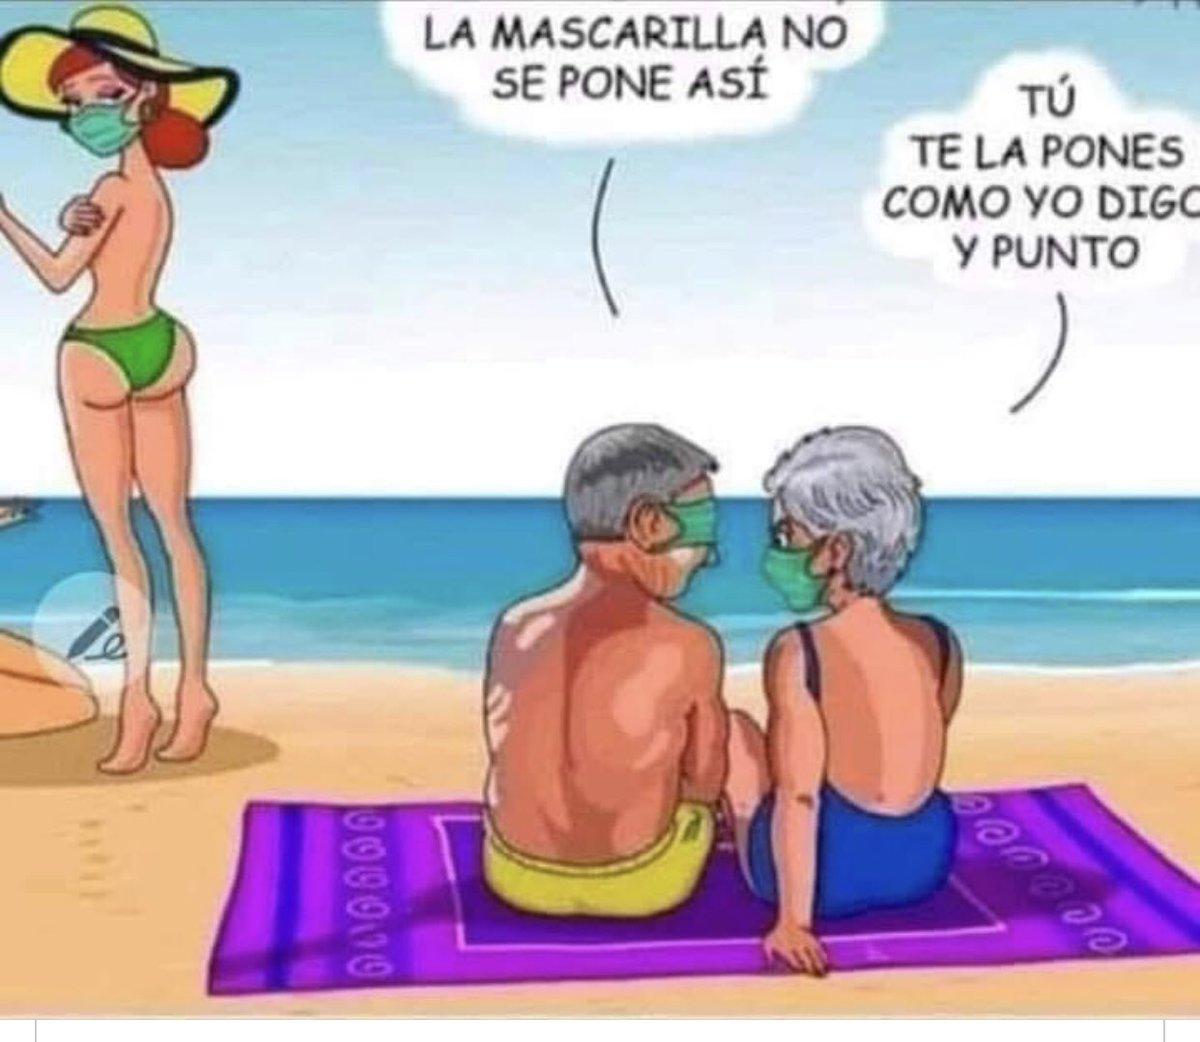 #Memes #Memes2020 #MemesDeLaSemana #MemesMéxico #Humor #Comedia #Risas #Chistes #ImágenesGraciosas #México #VivaMéxico #CoronavirusMemes #CoronavirusMeme #Cuarentena  JAJAJAJAJAJA 🤣🤣🤣 https://t.co/2EhEV1HflR